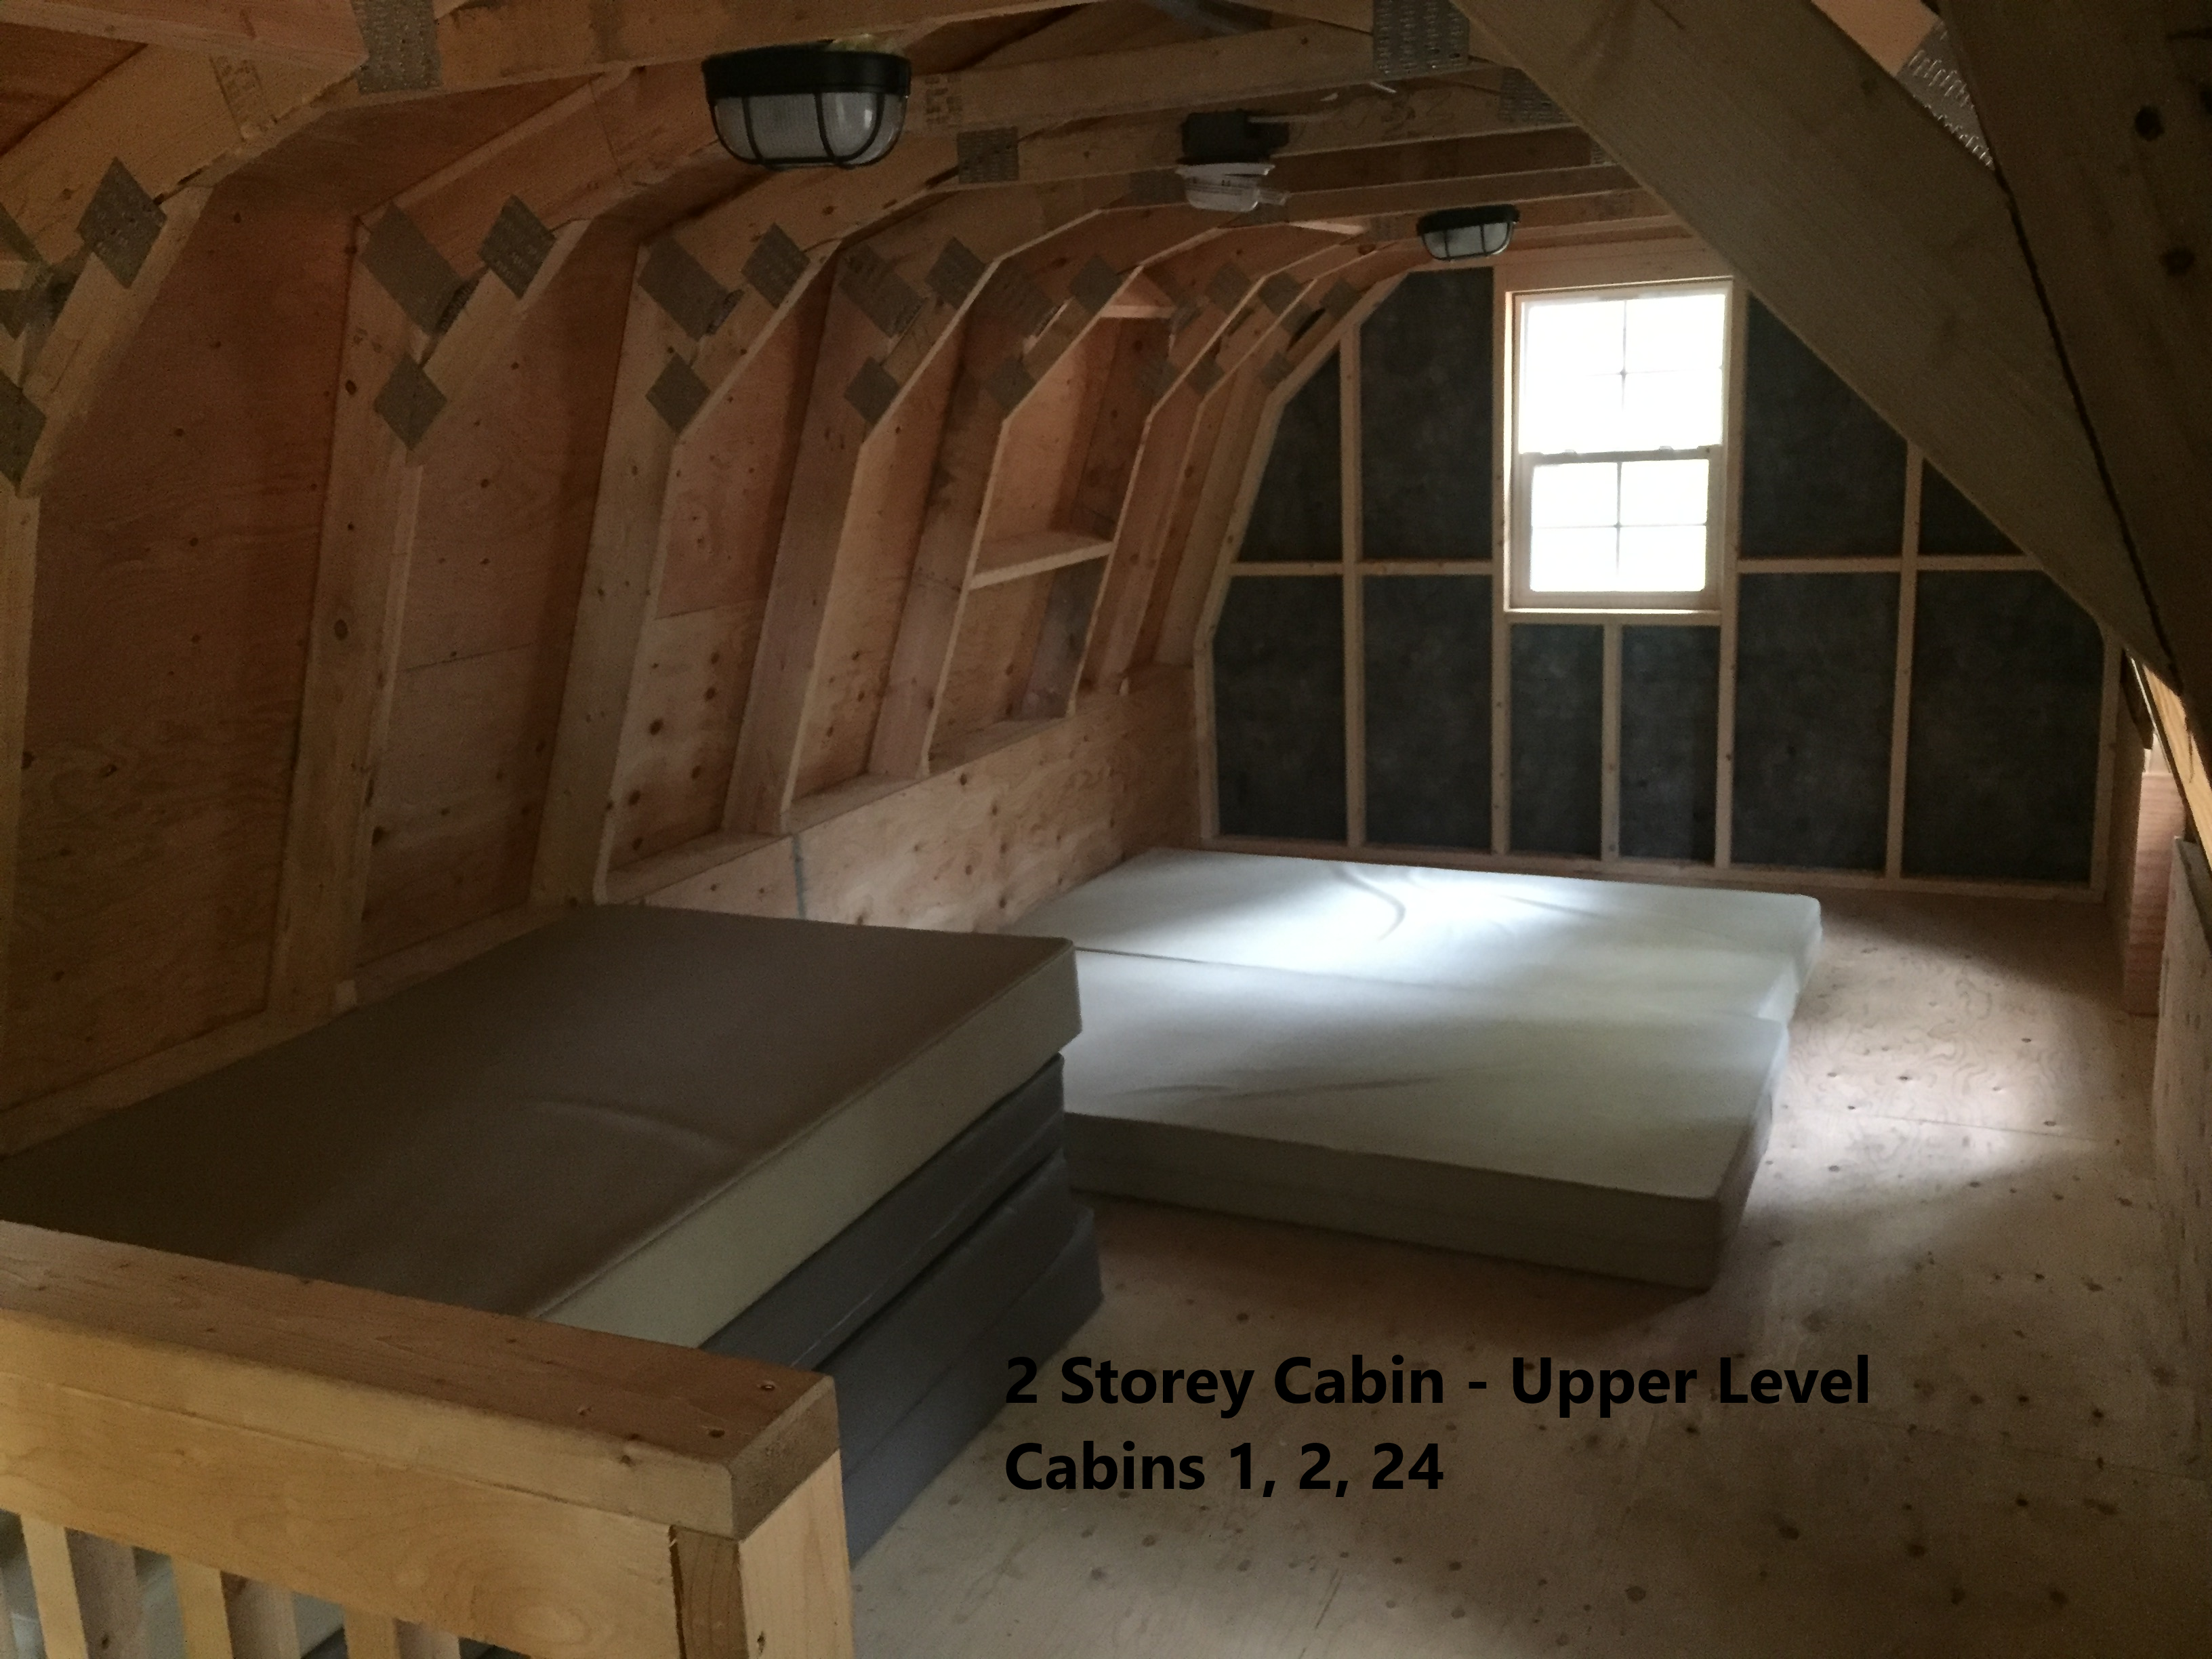 2 Storey Cabin Upper Level - Cabins 1, 2, 24